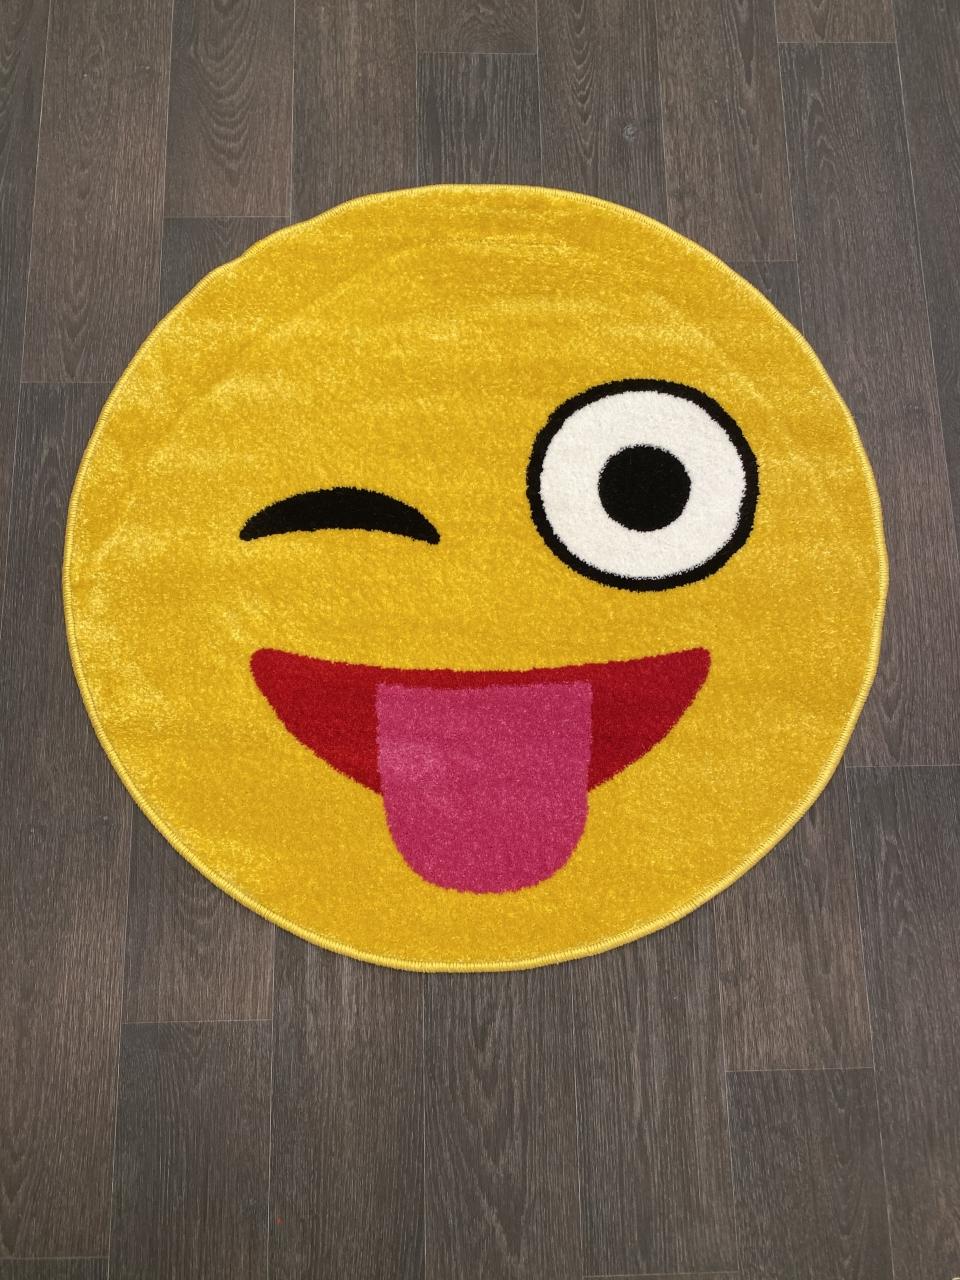 Ковер NC17 - YELLOW - Круг - коллекция SMILE - фото 1